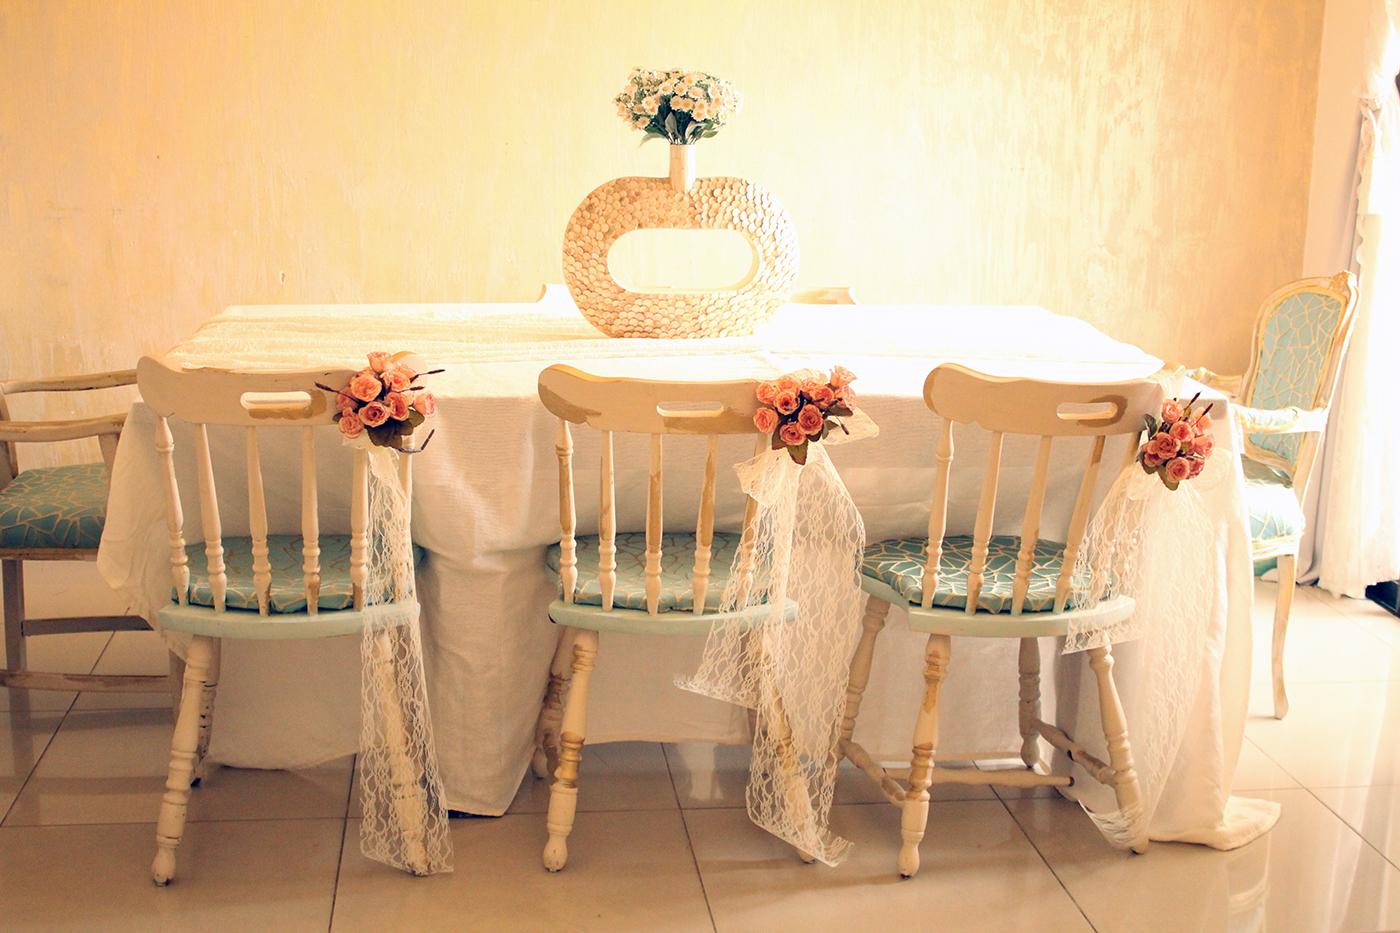 IMG 8067 - חידוש כסאות לפינת אוכל בסלון